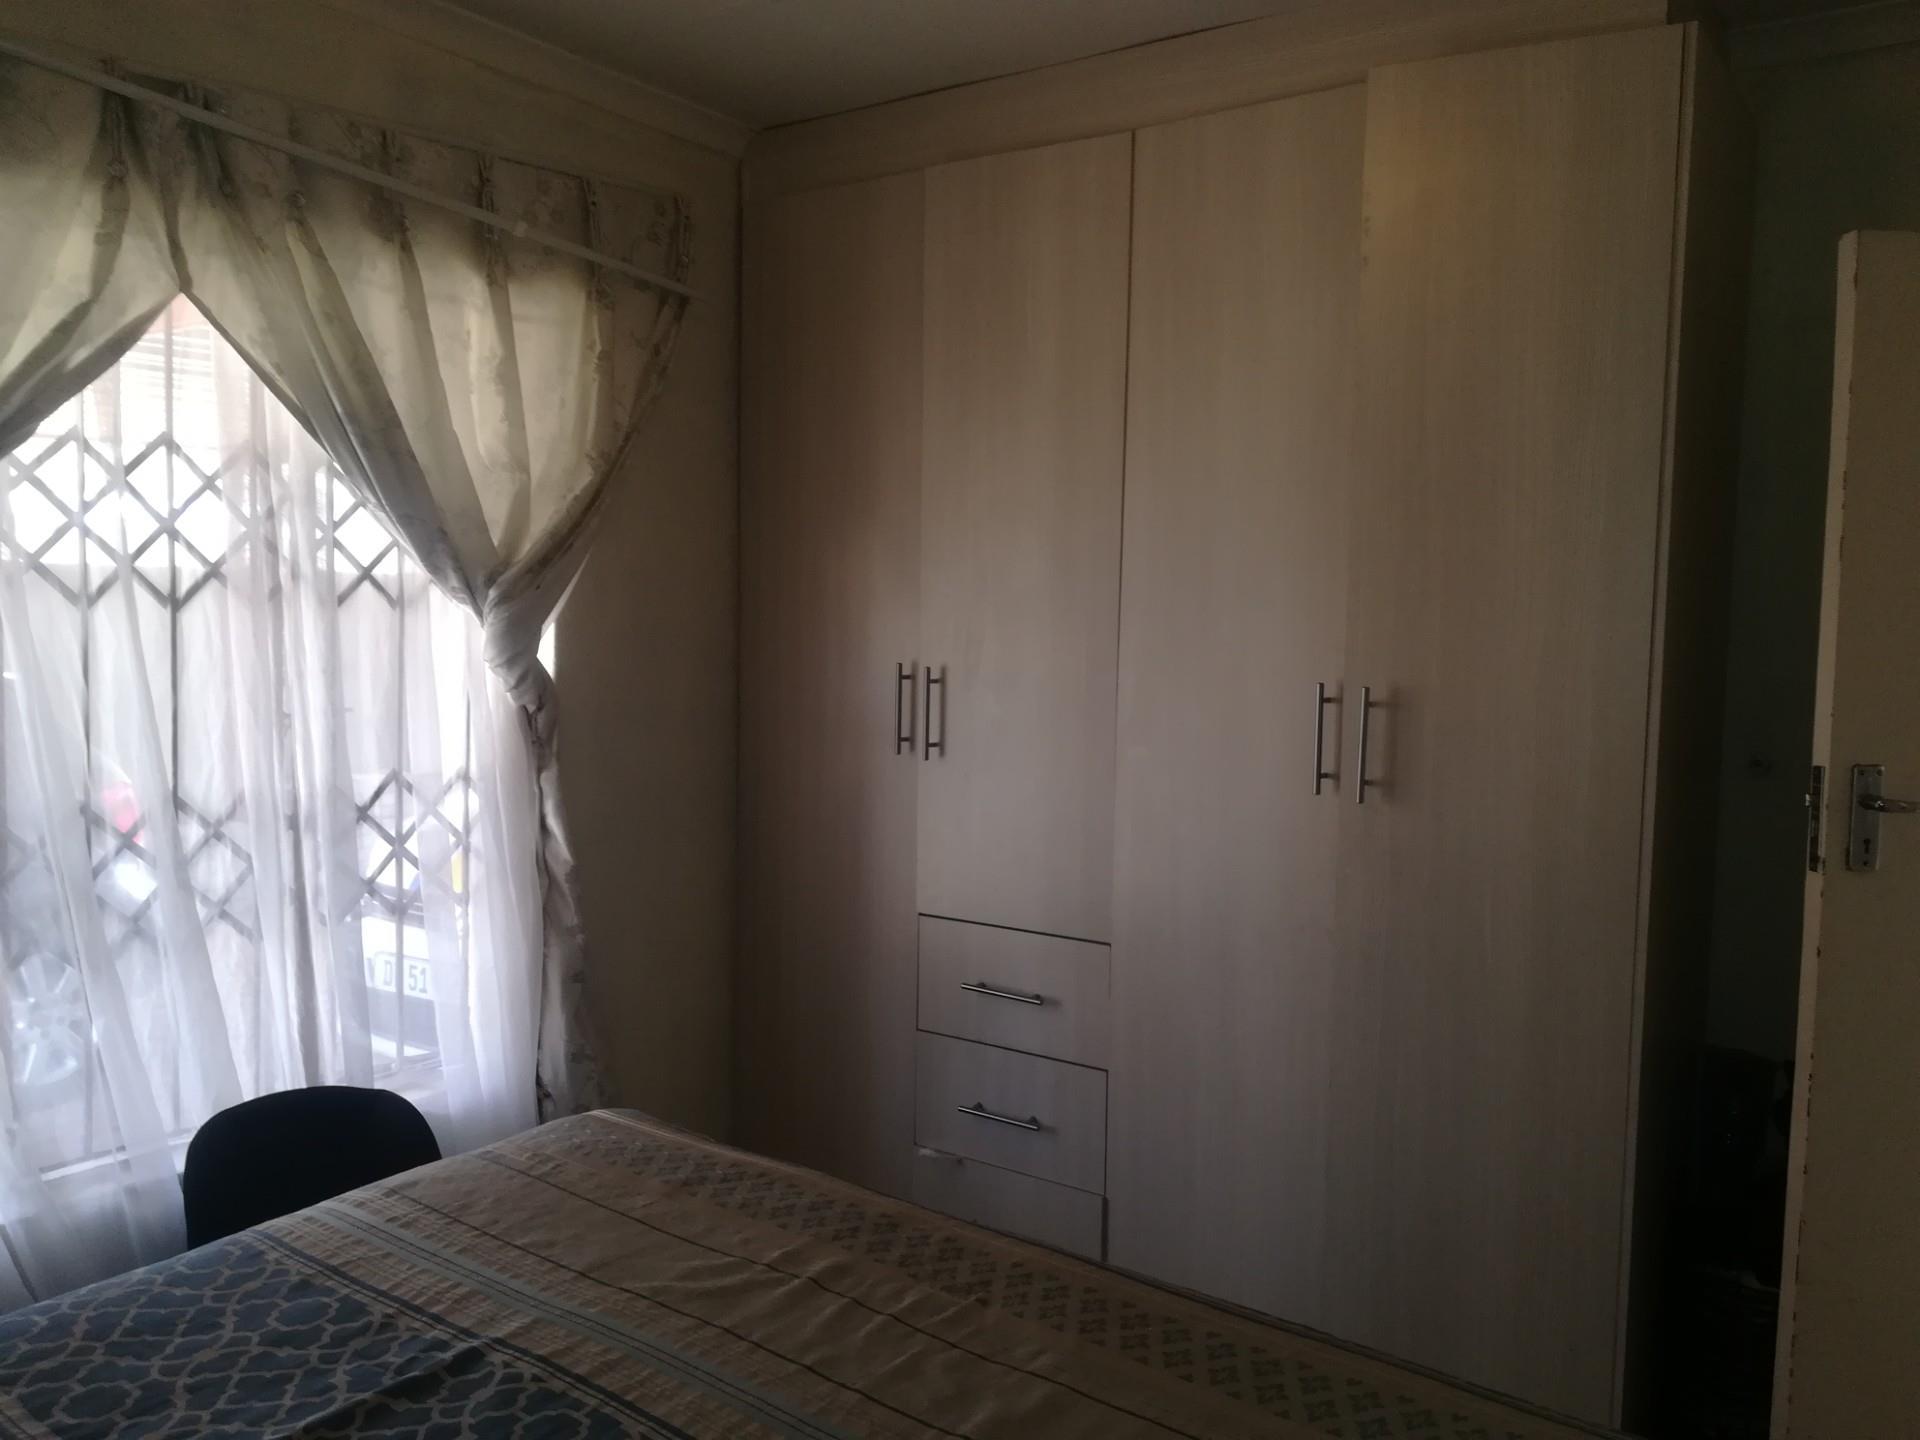 2 Bedroom House To Rent in Groblerpark